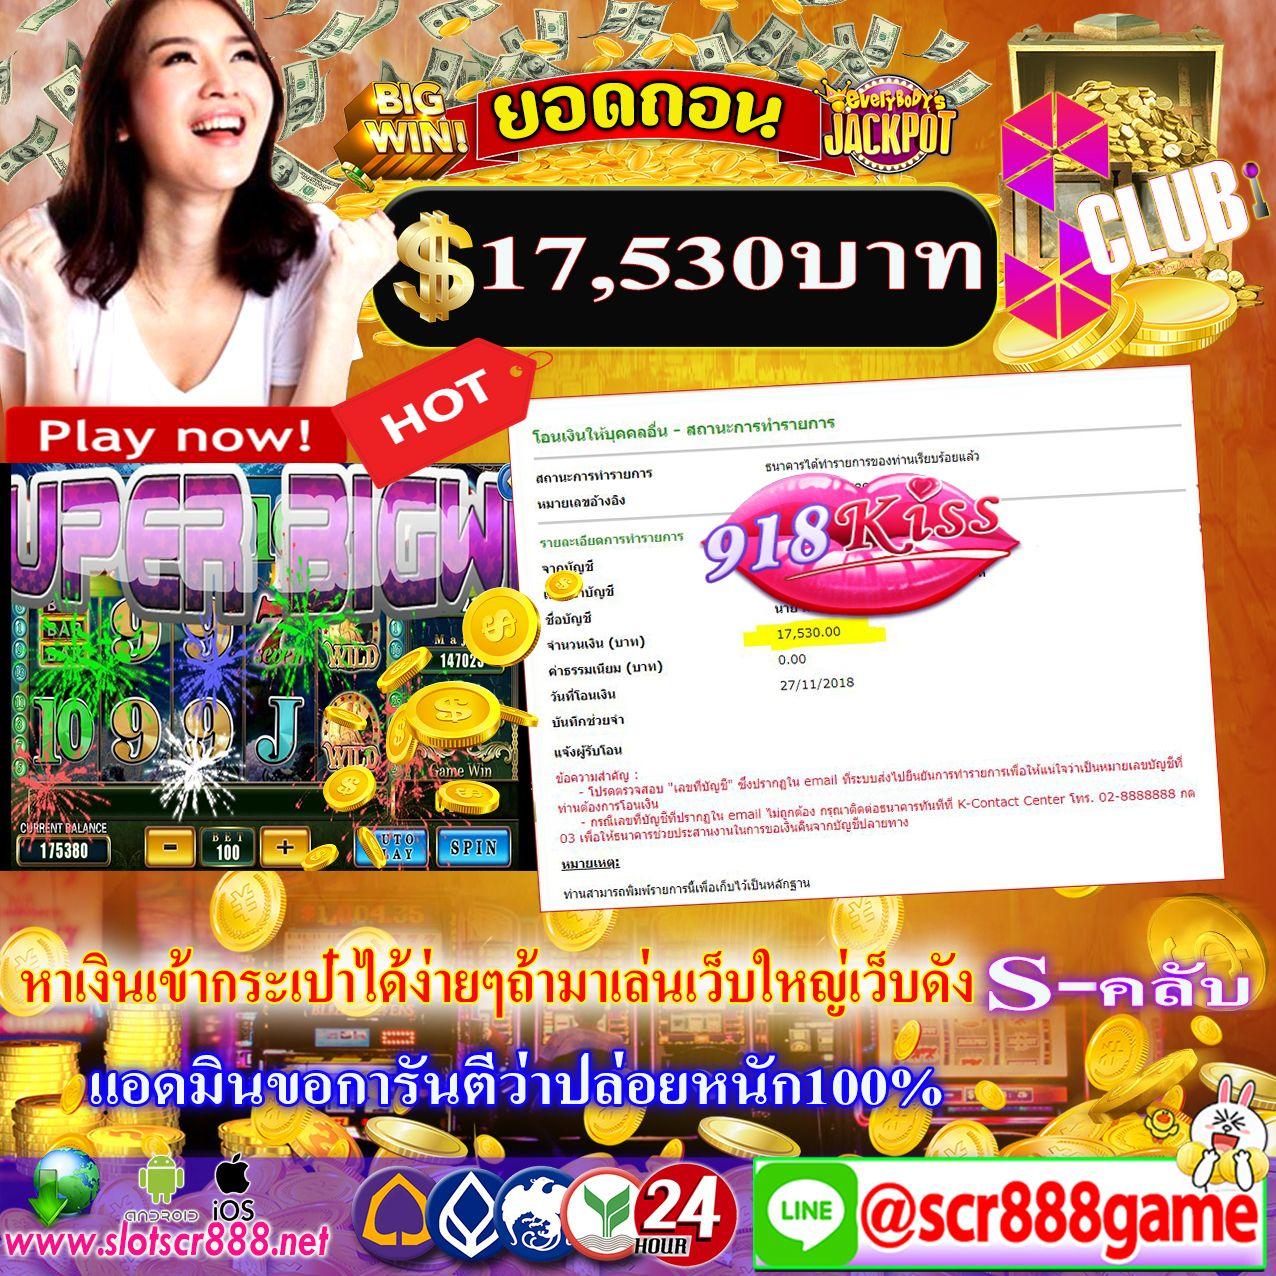 Pin by Mohamad Haziq on Malaysia Jackpot, Bonus